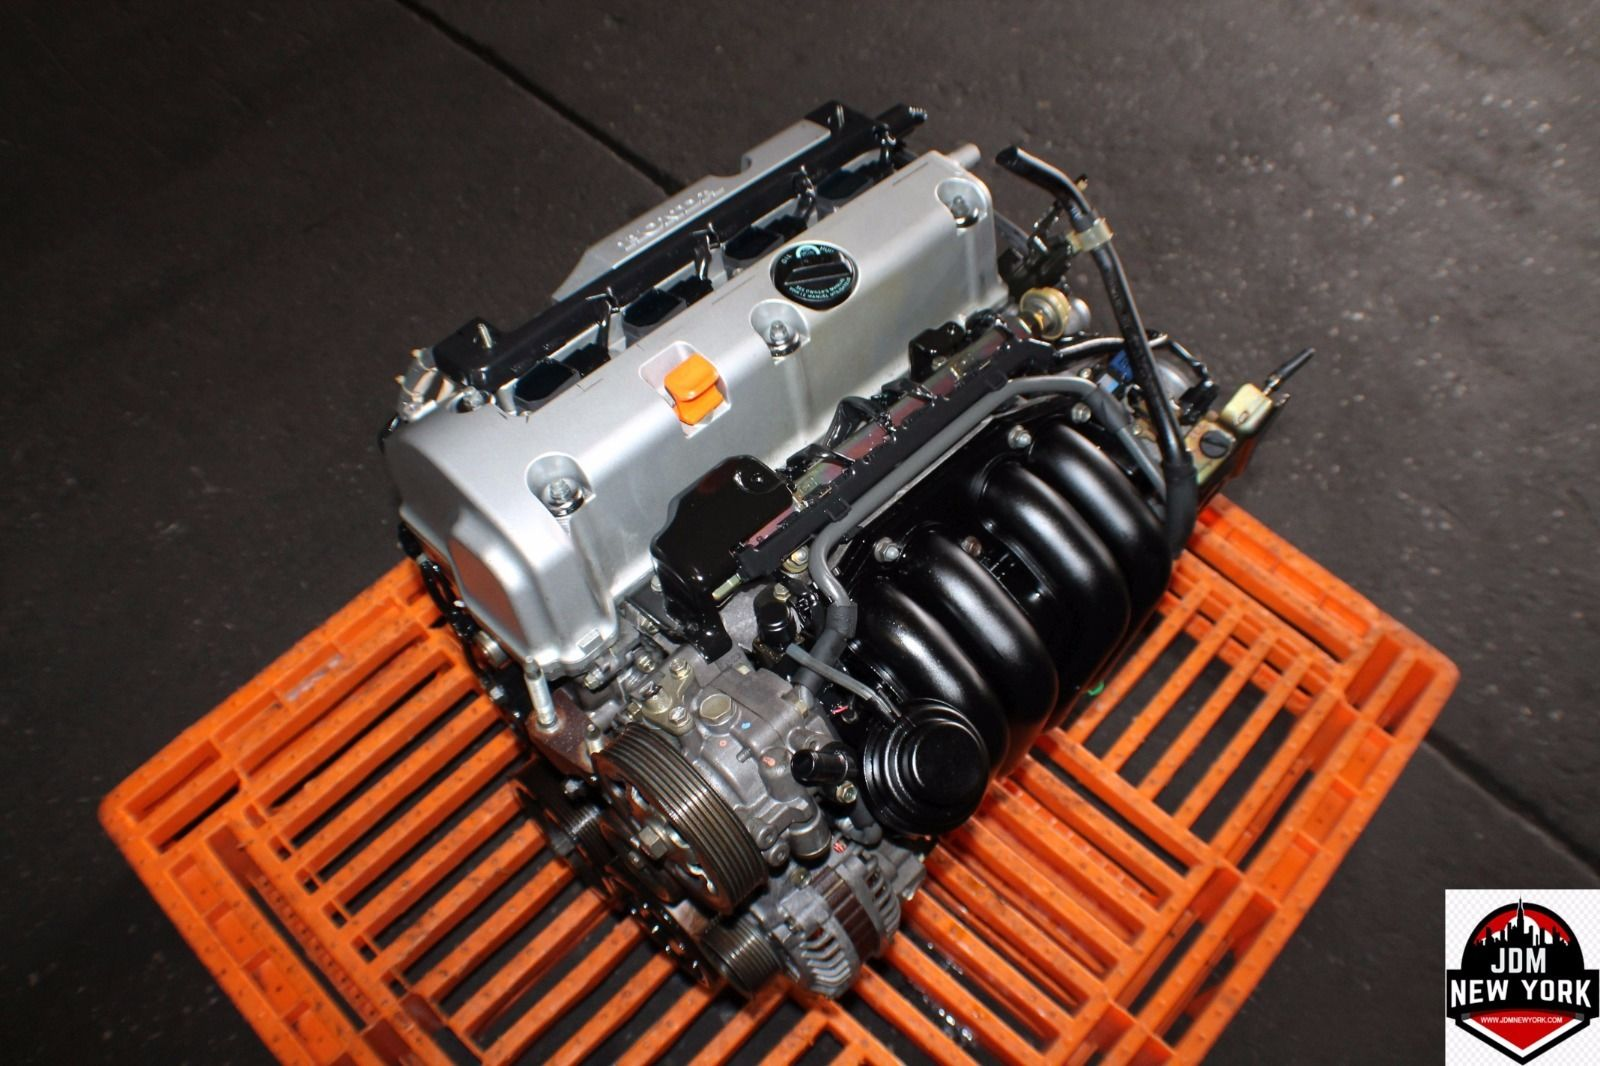 02 04 Acura Rsx Base 02 05 Honda Civic Si 2 0l I Vtec Engine Jdm K20a K20a3 Jdm New York